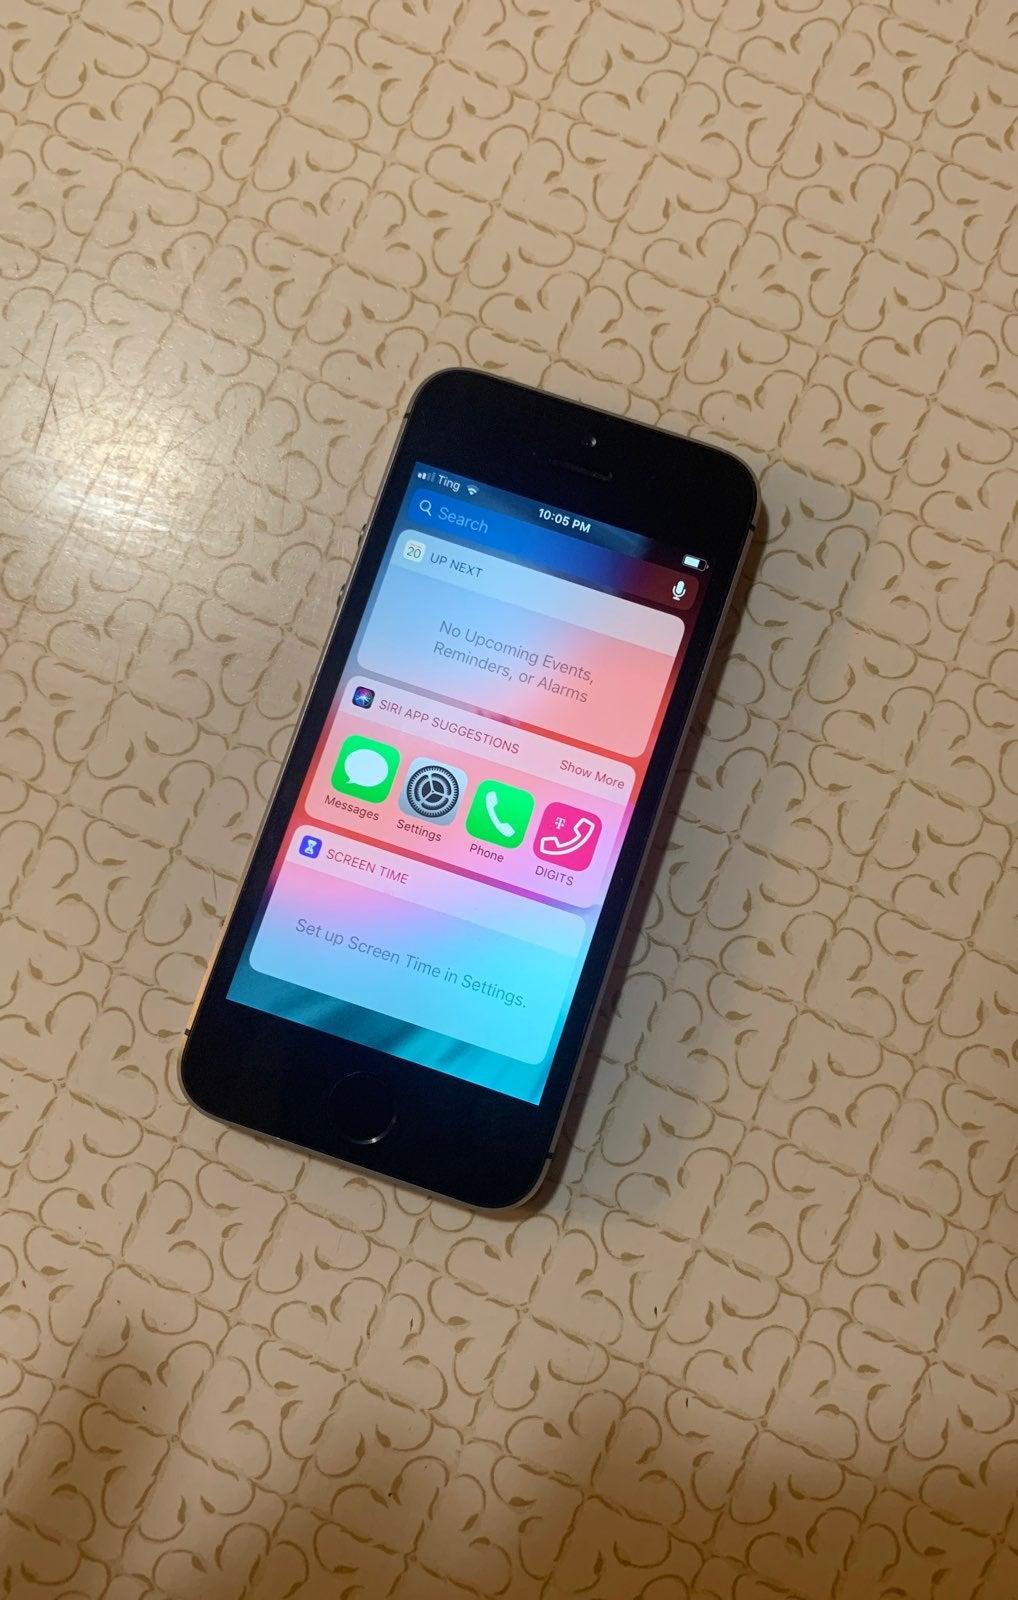 iPhone 5s Space Gray 16 GB Unlocked